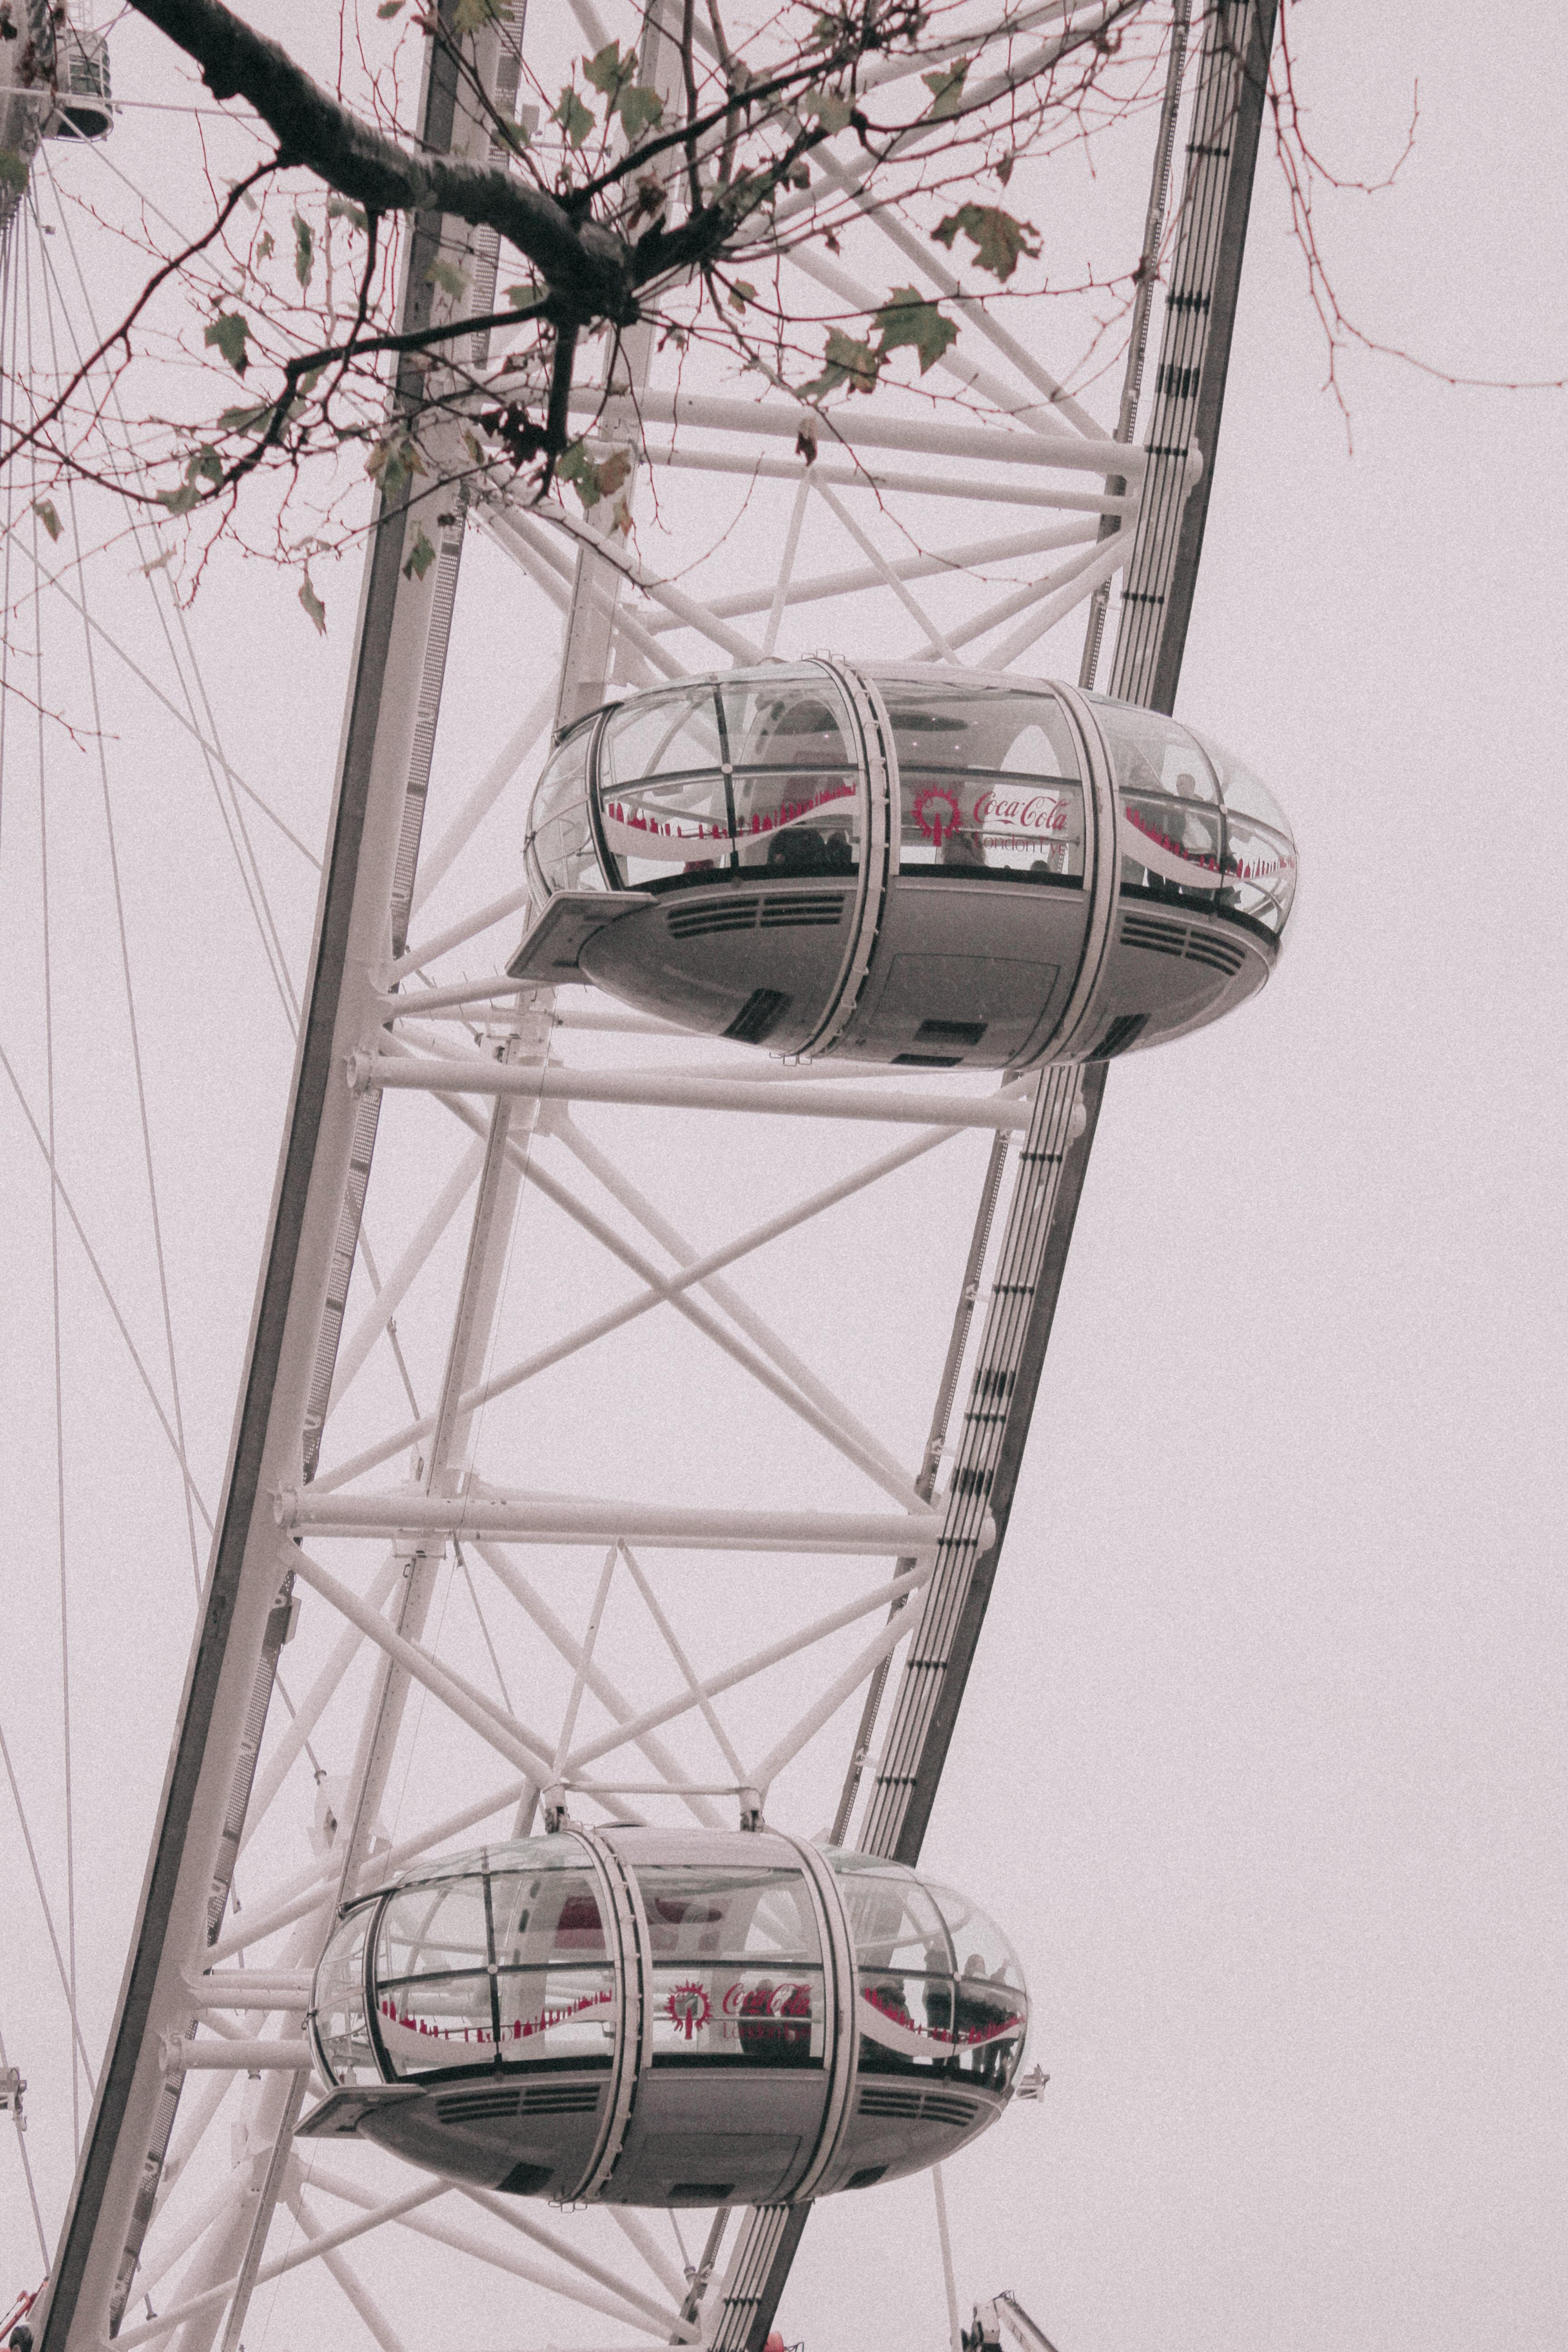 white Ferris wheel under gray skies